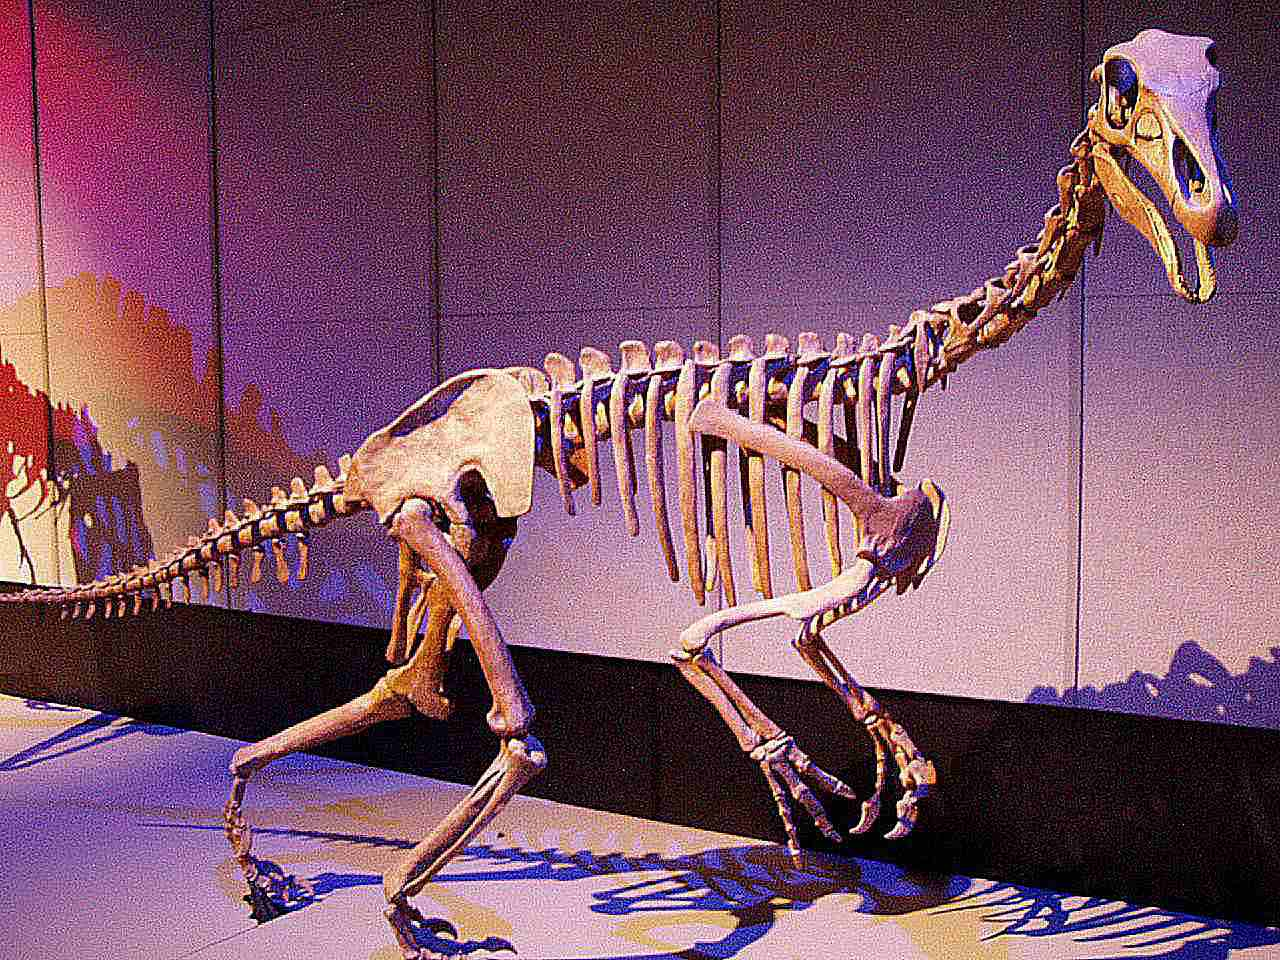 alxasaurus